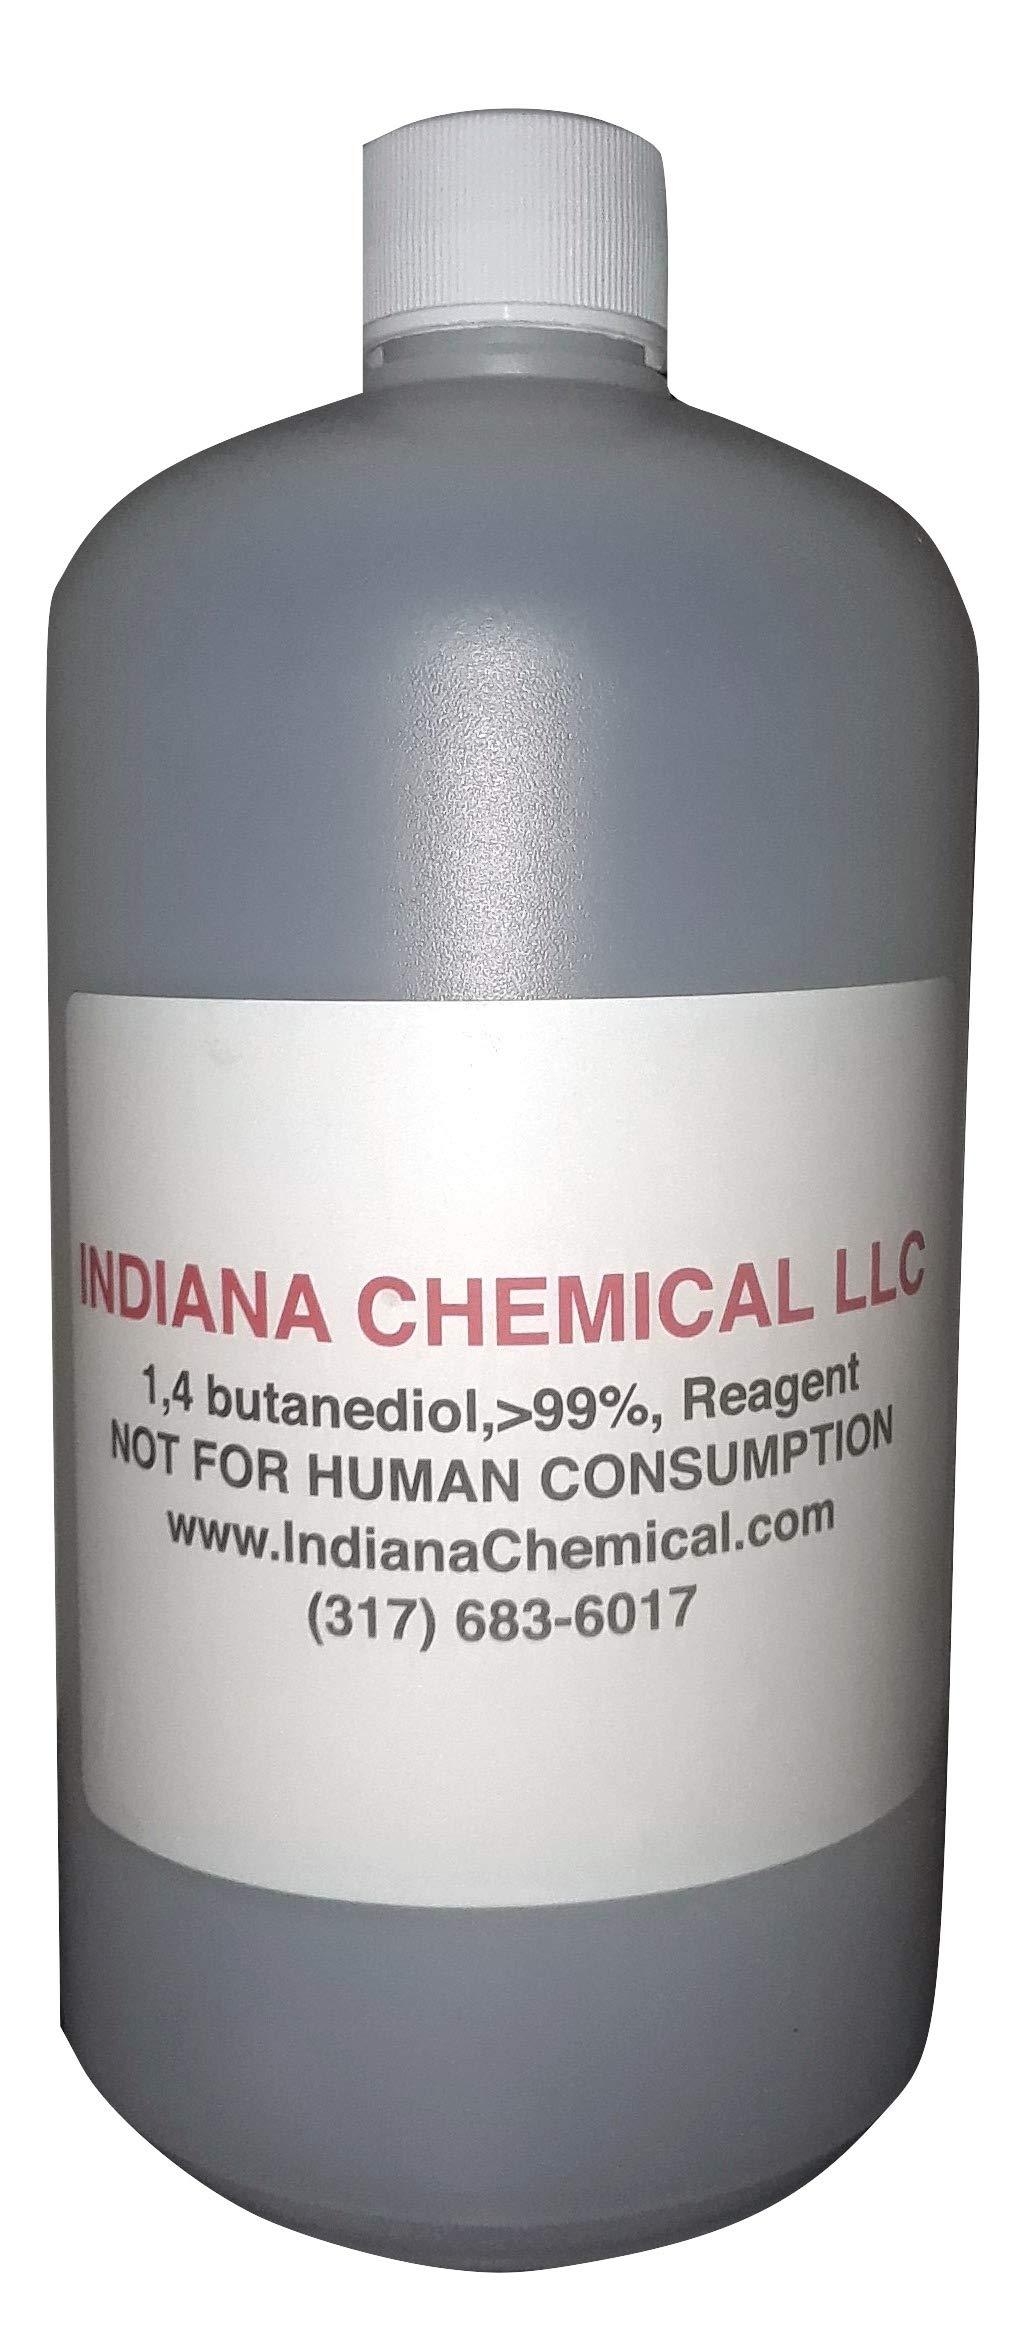 1,4 butanediol (500ml)